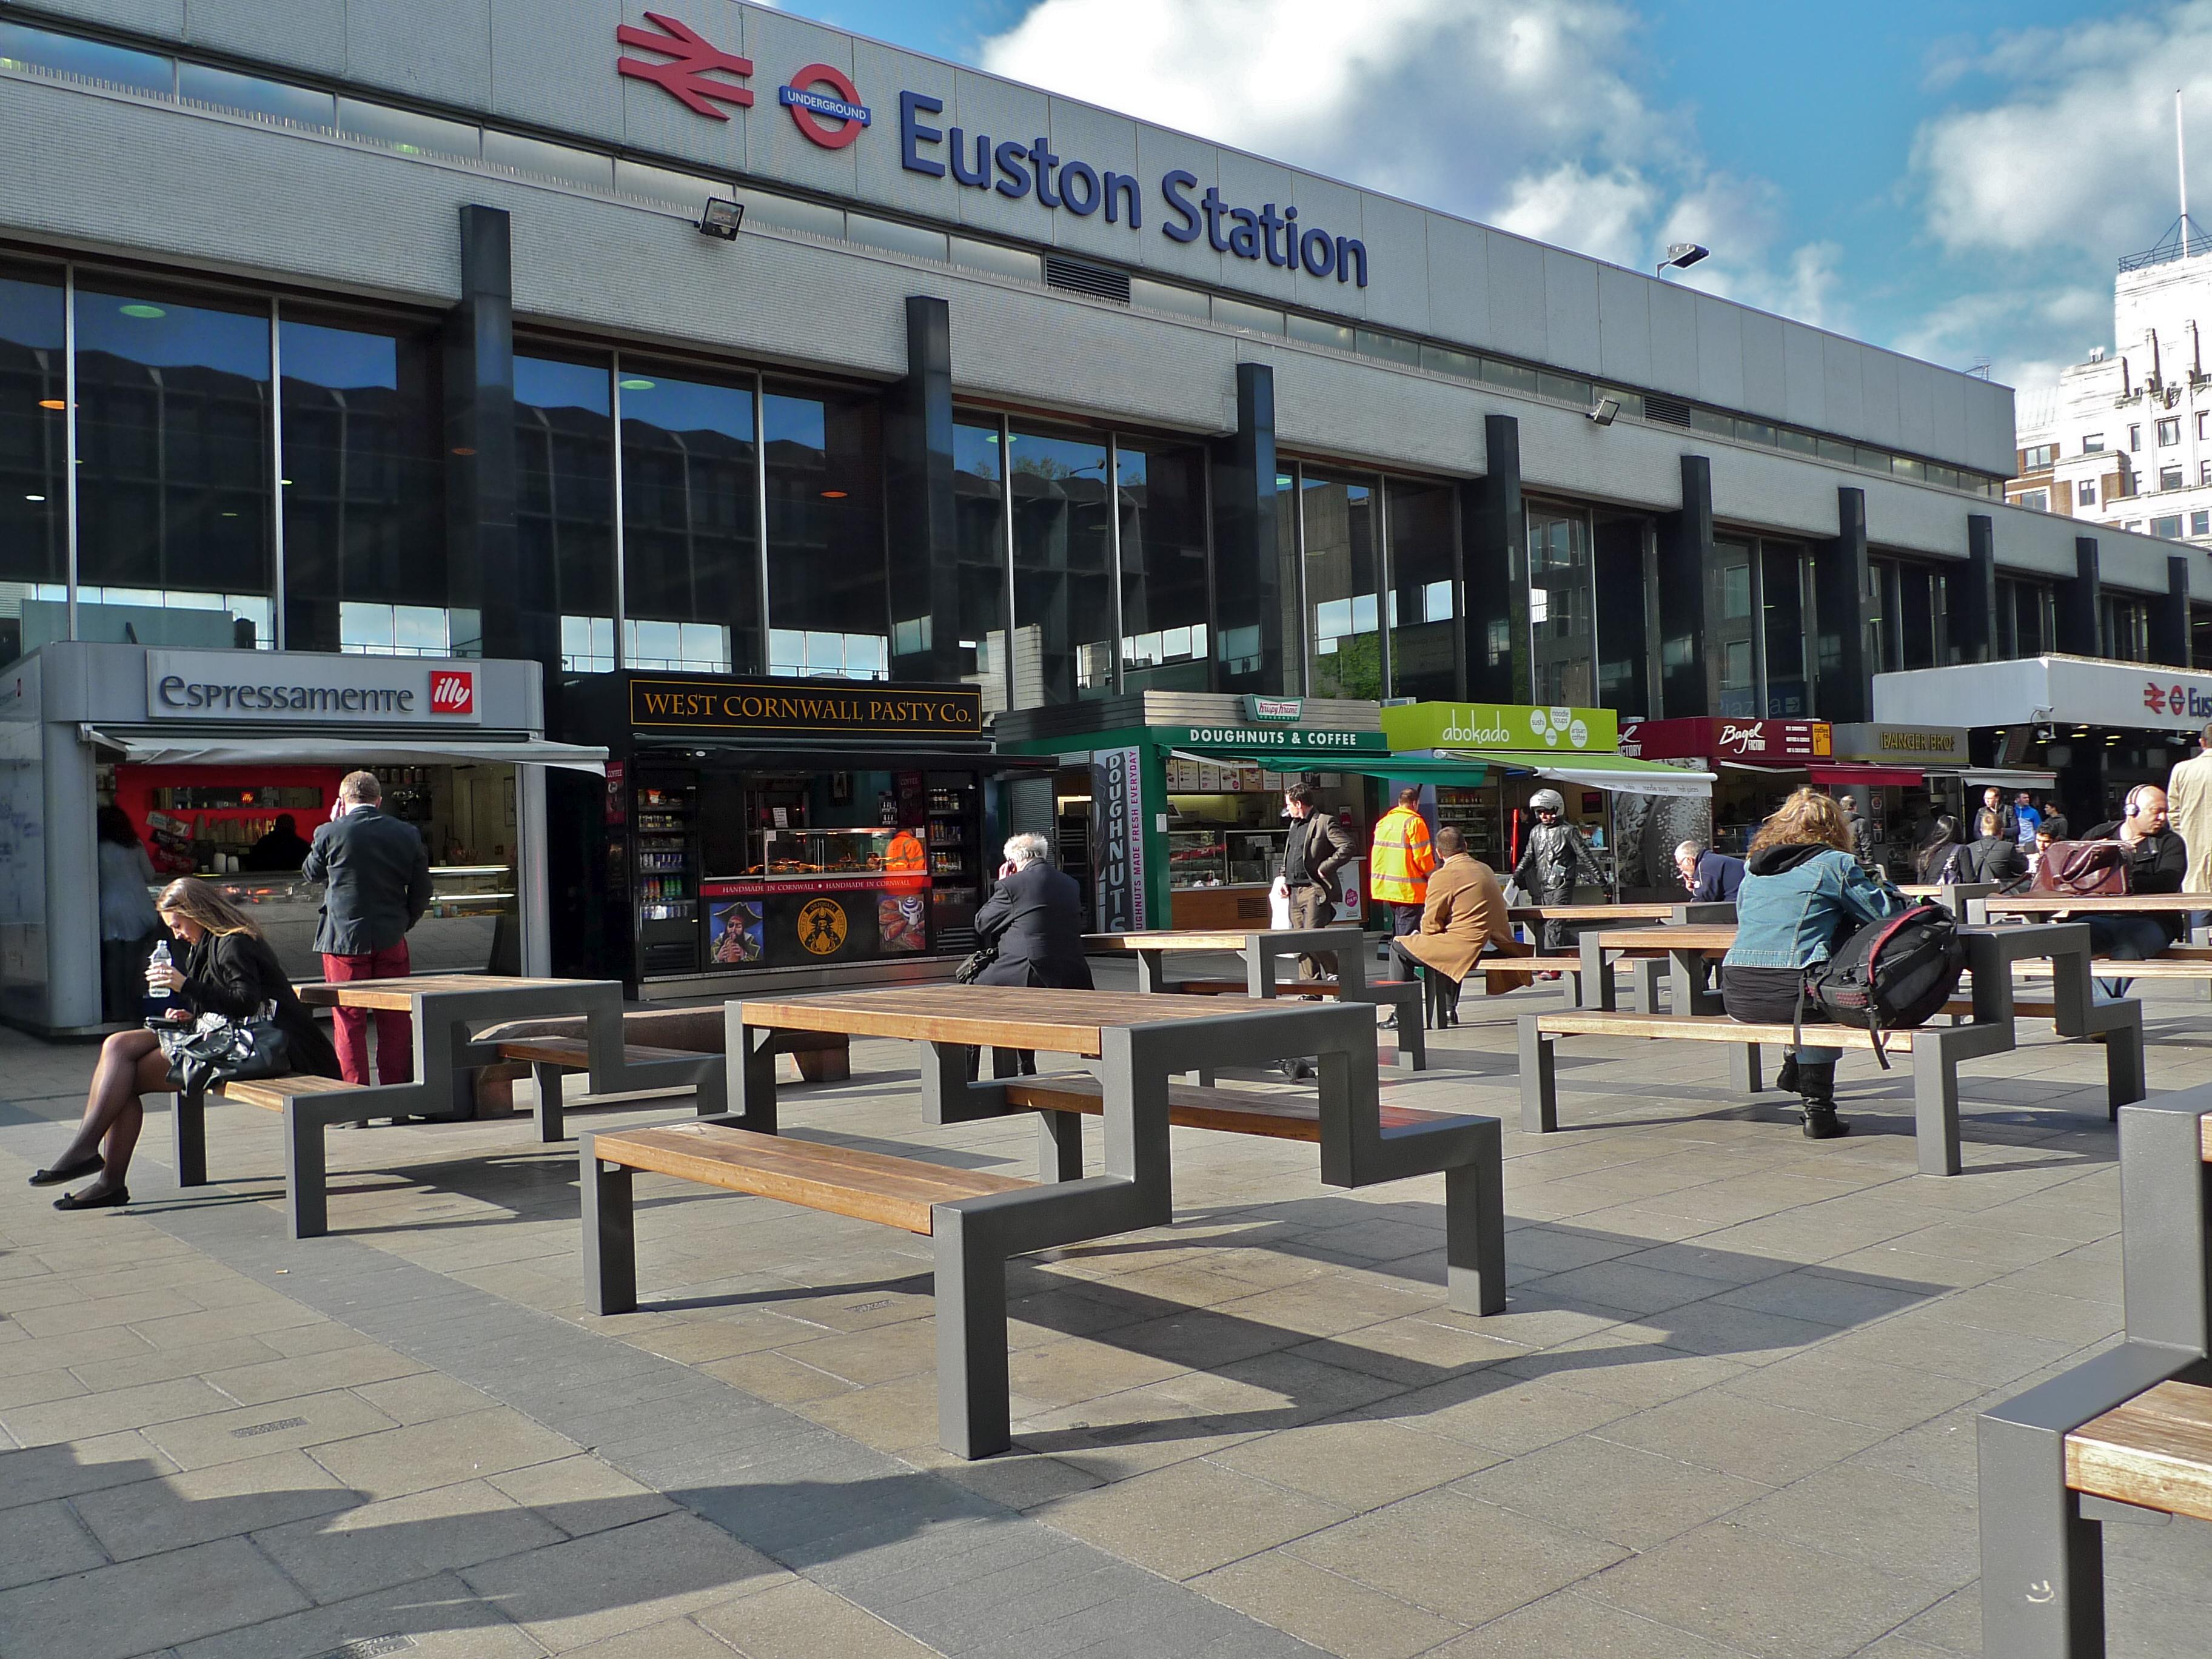 Hotels near Euston Station - Hilton London Euston